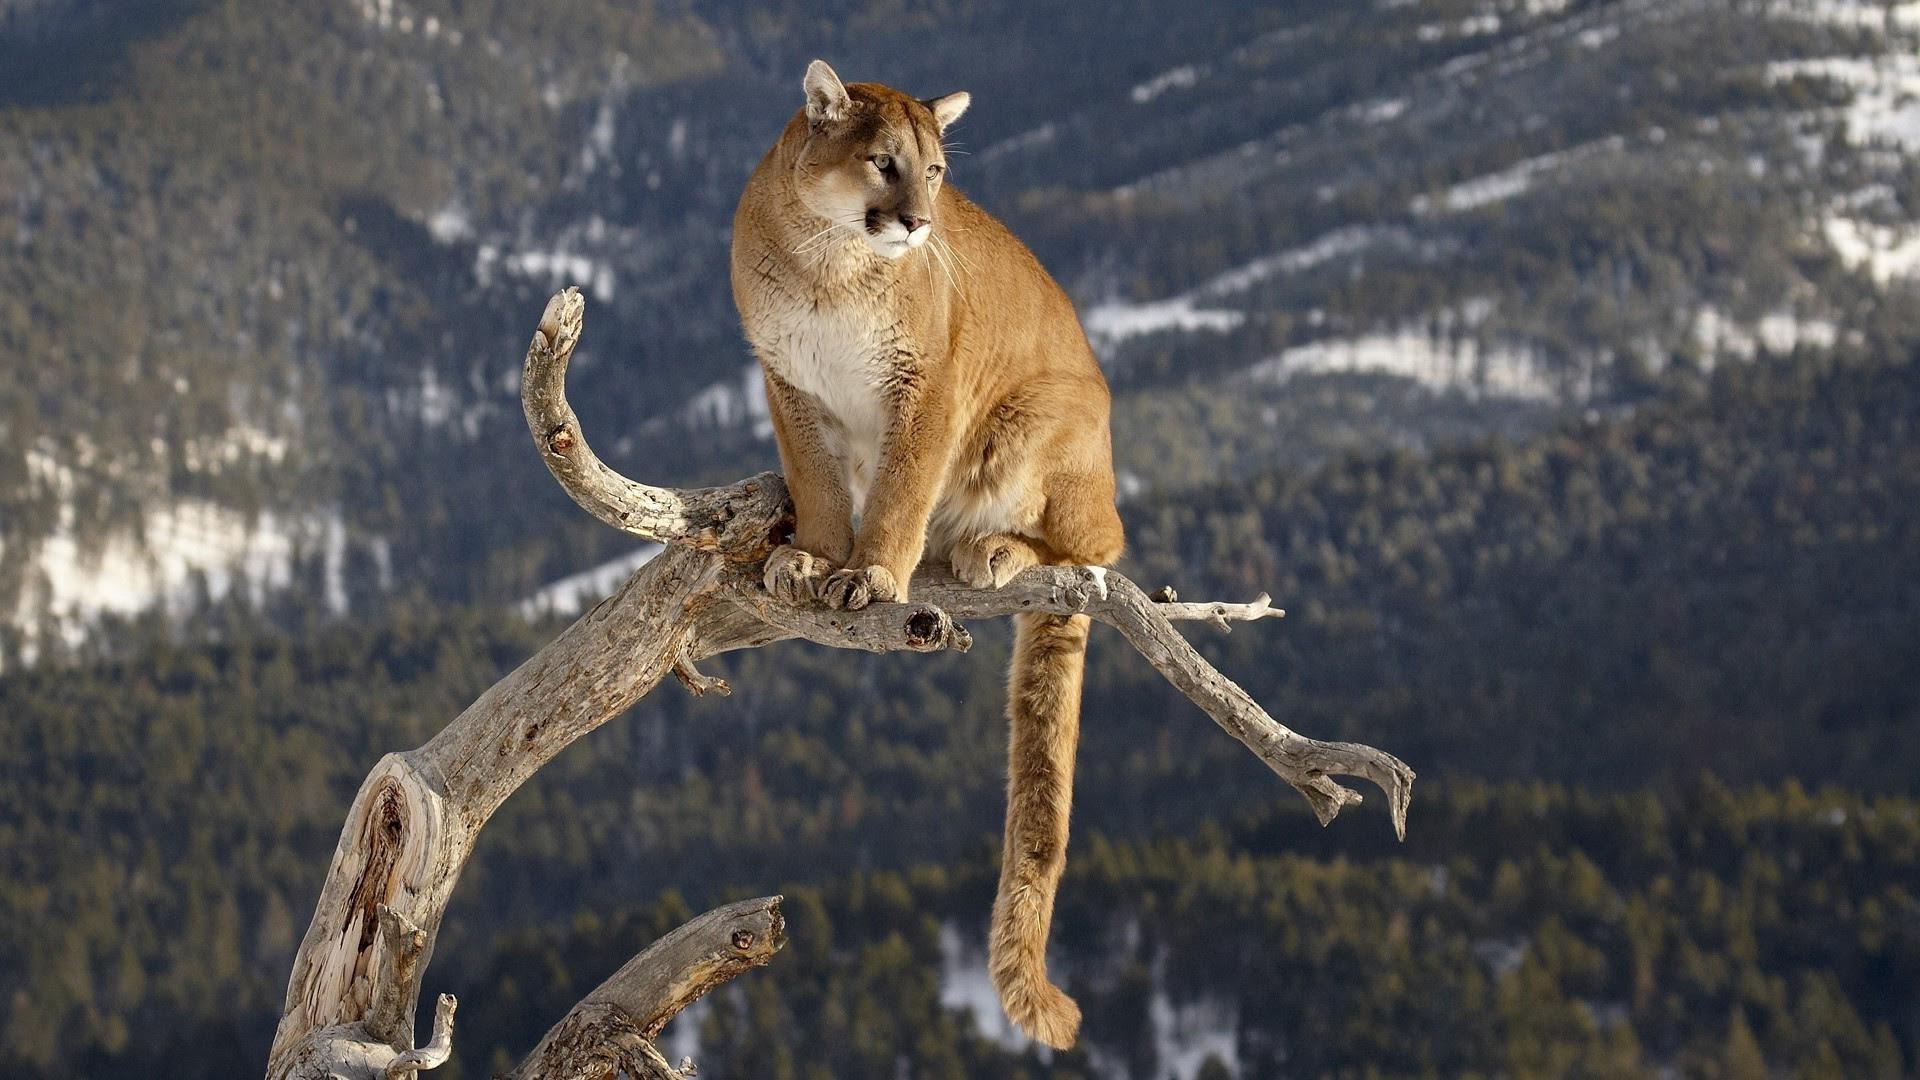 Pumas Wallpaper (62+ images)